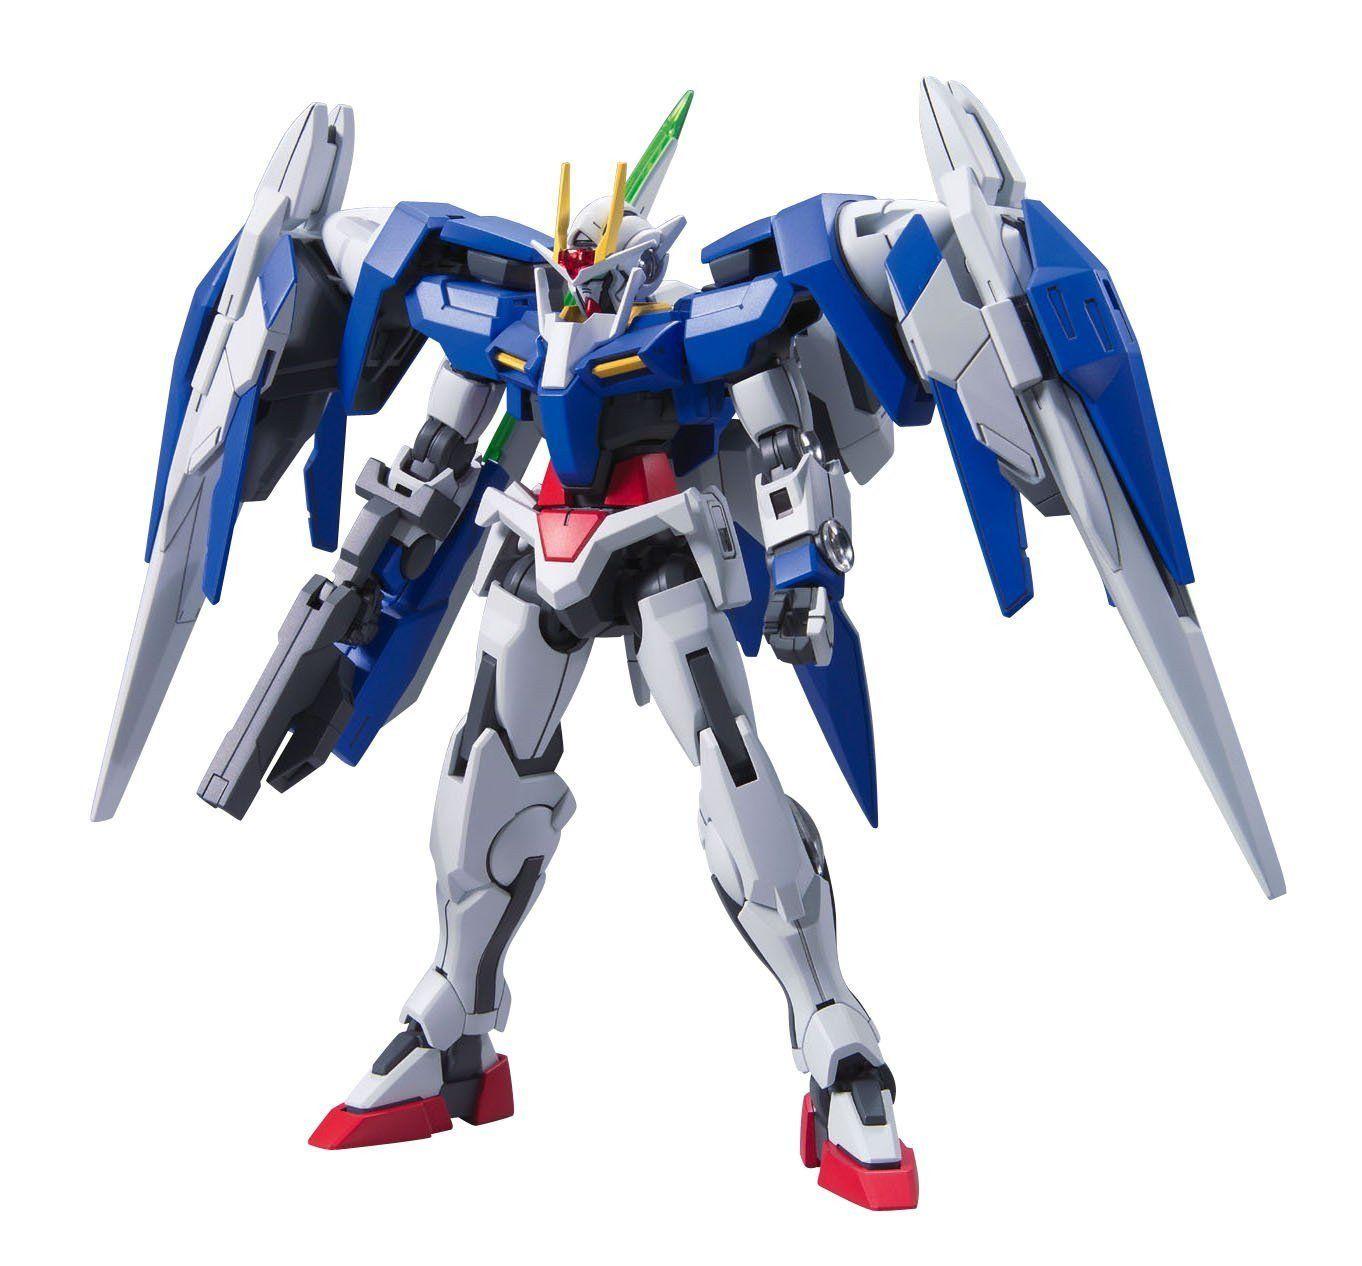 hg 1 144 54 oo raiser gn sword usa gundam store gundam model